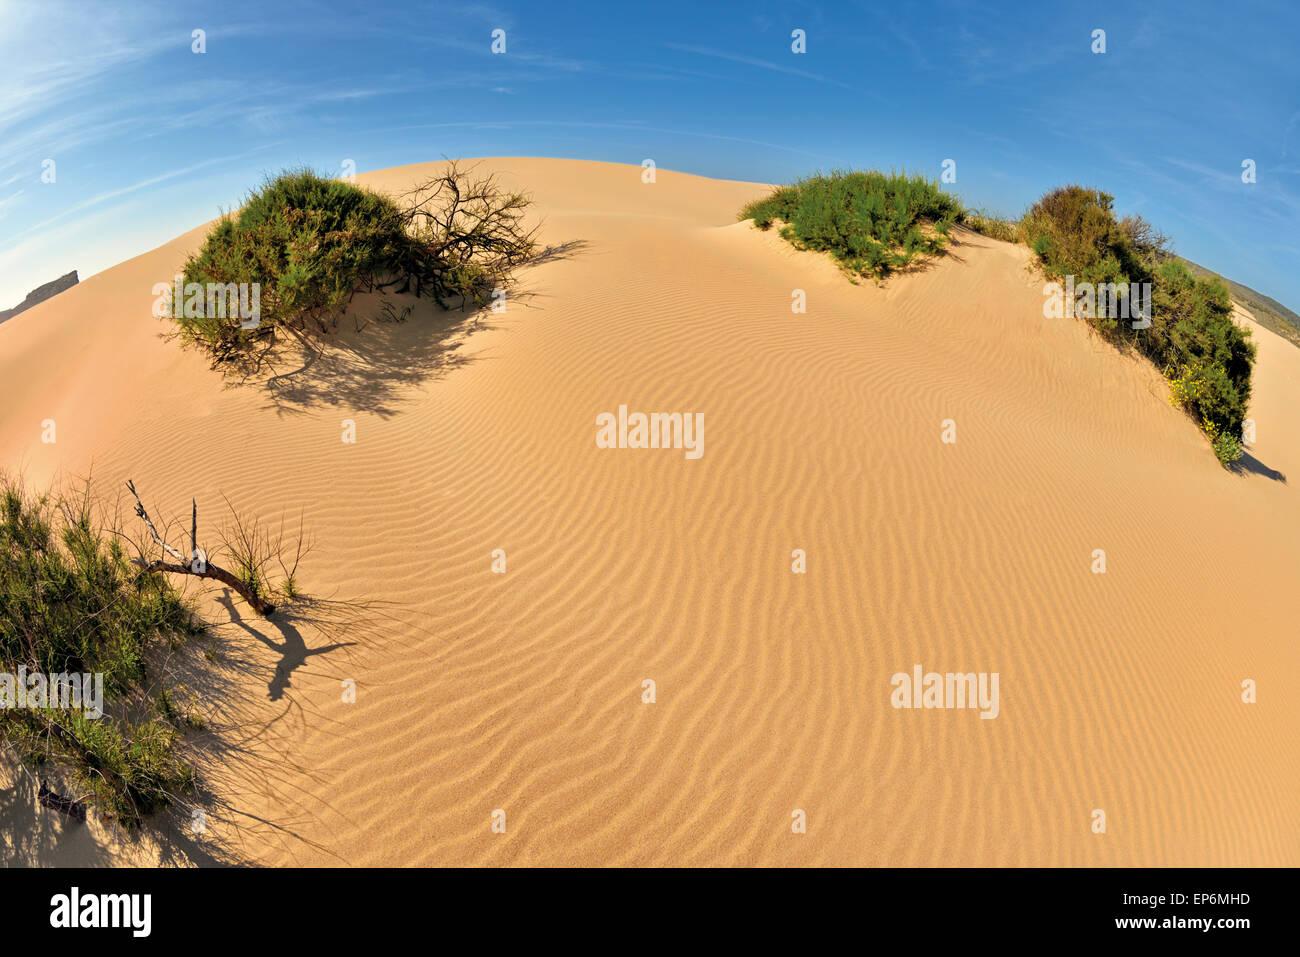 Portugal, Algarve: Sand dune with coastal vegetation in Carrapateira - Stock Image